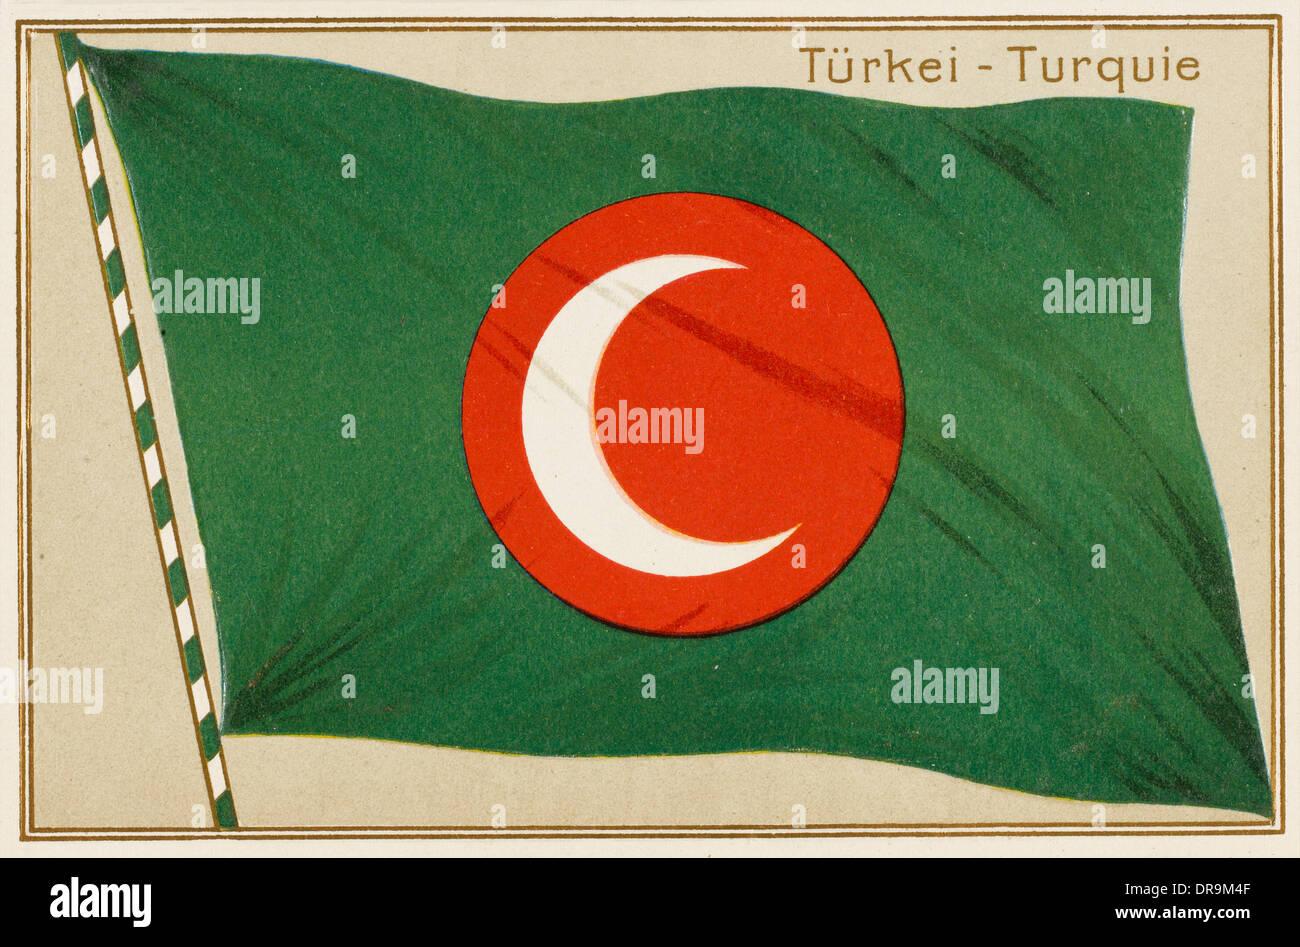 Ottoman Empire Flag - Stock Image